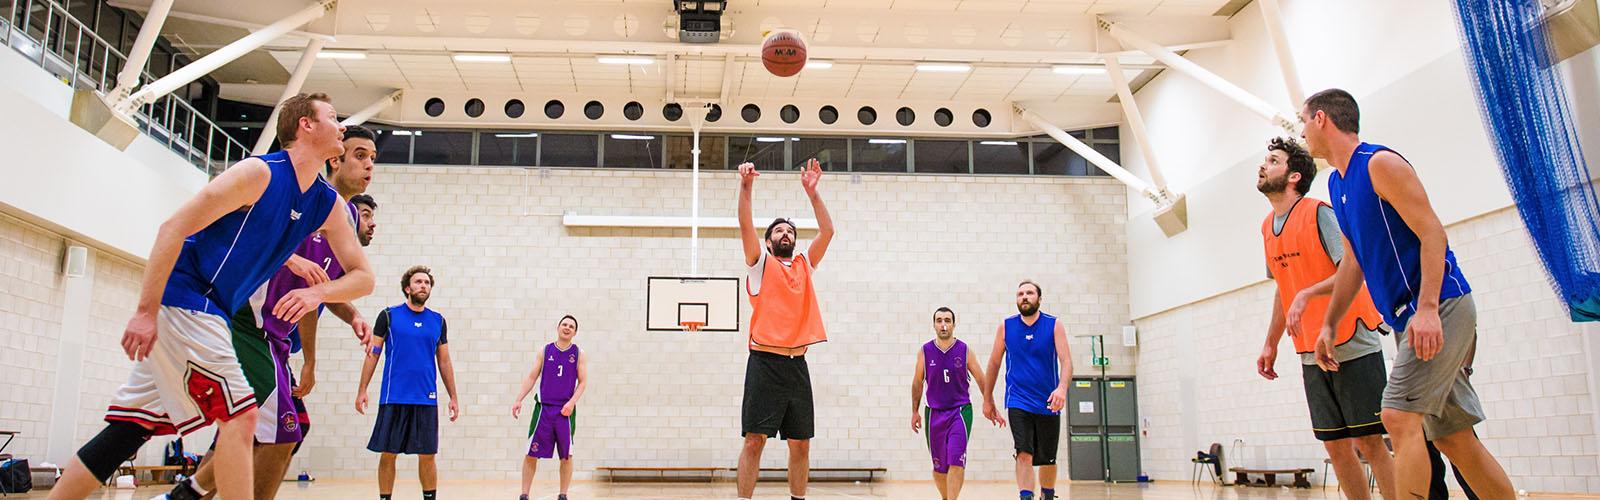 _0035_GOMammoth-Basketball-London